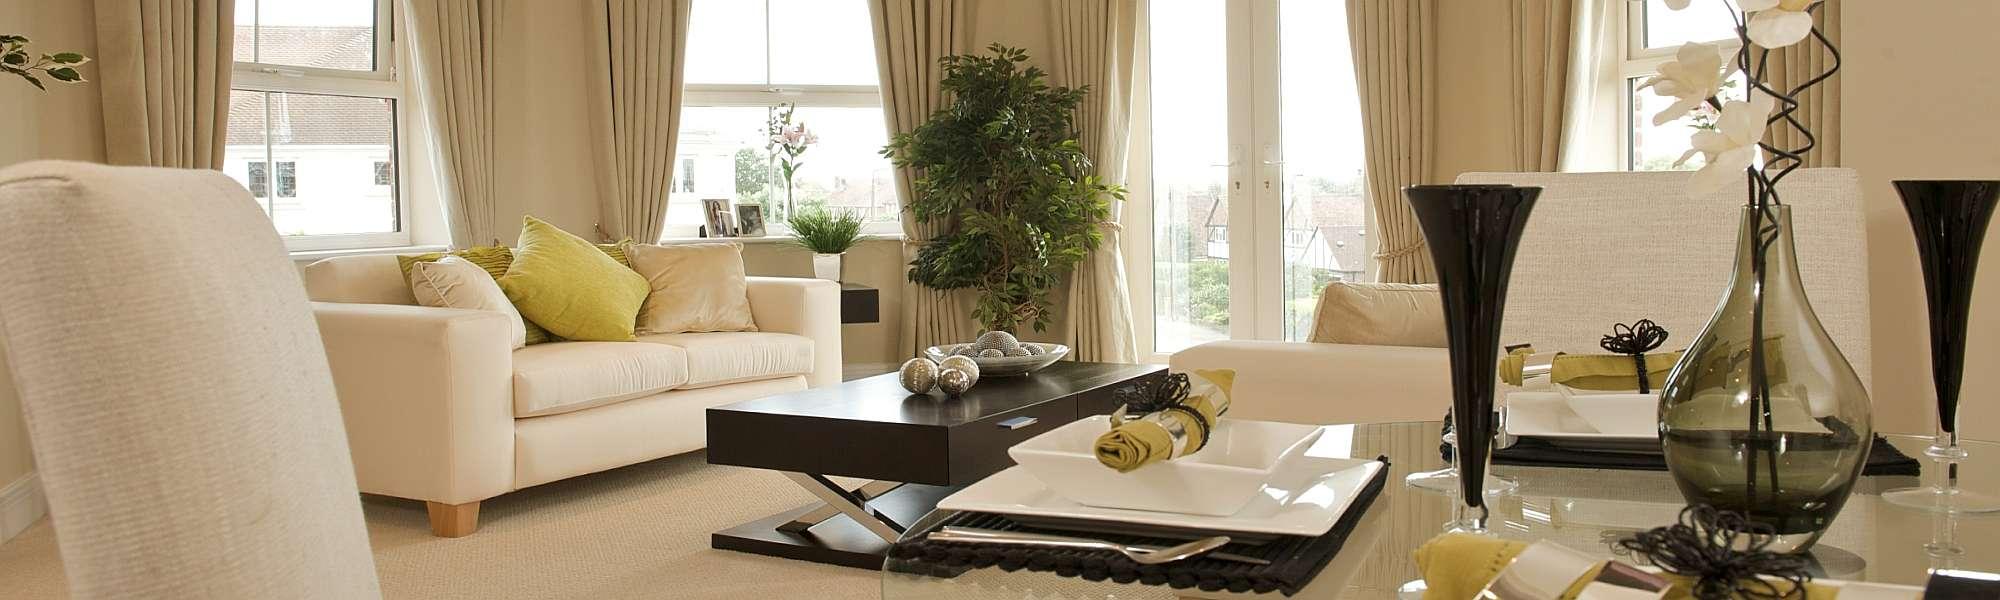 thumb_sorl_white-lounge-banner_jpg_2000x600_crop_upscale_sharpen_q60